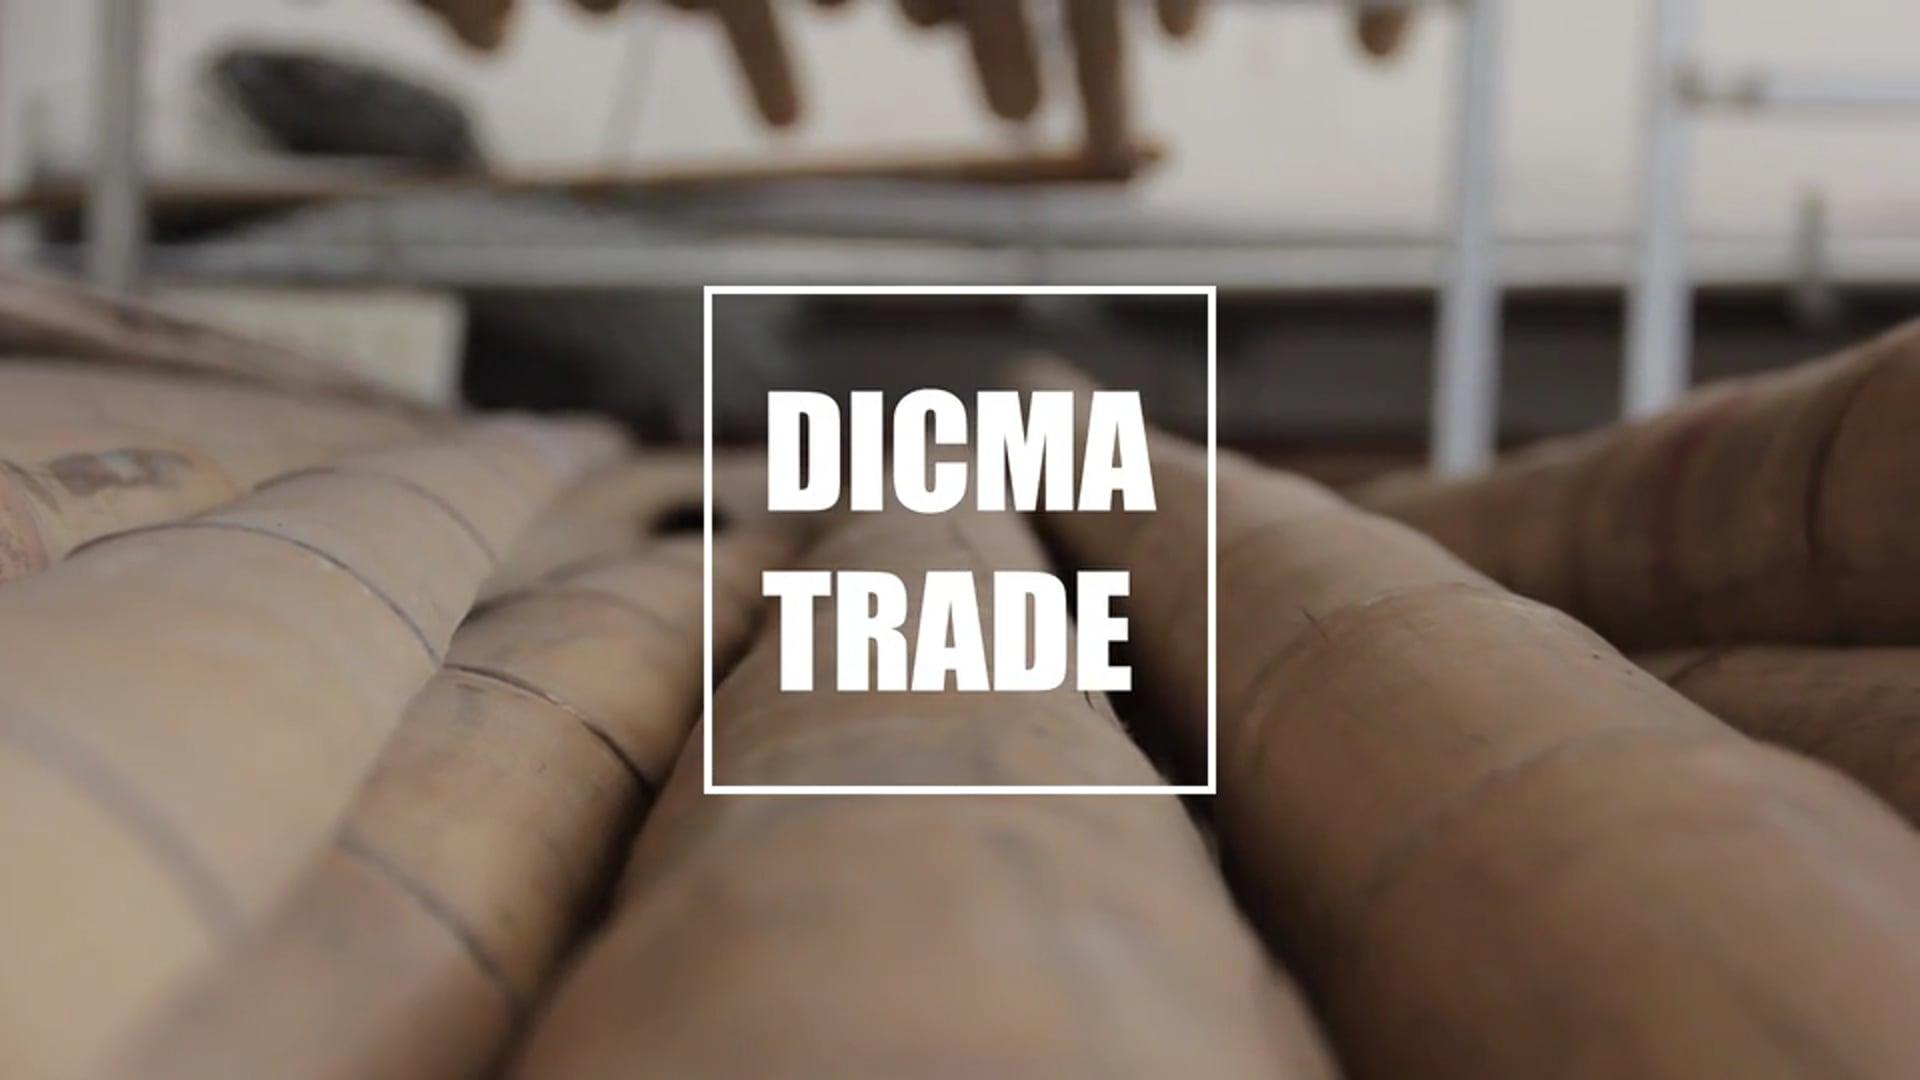 Dicma Trade   Peter Van Lengen   Bio Architecture